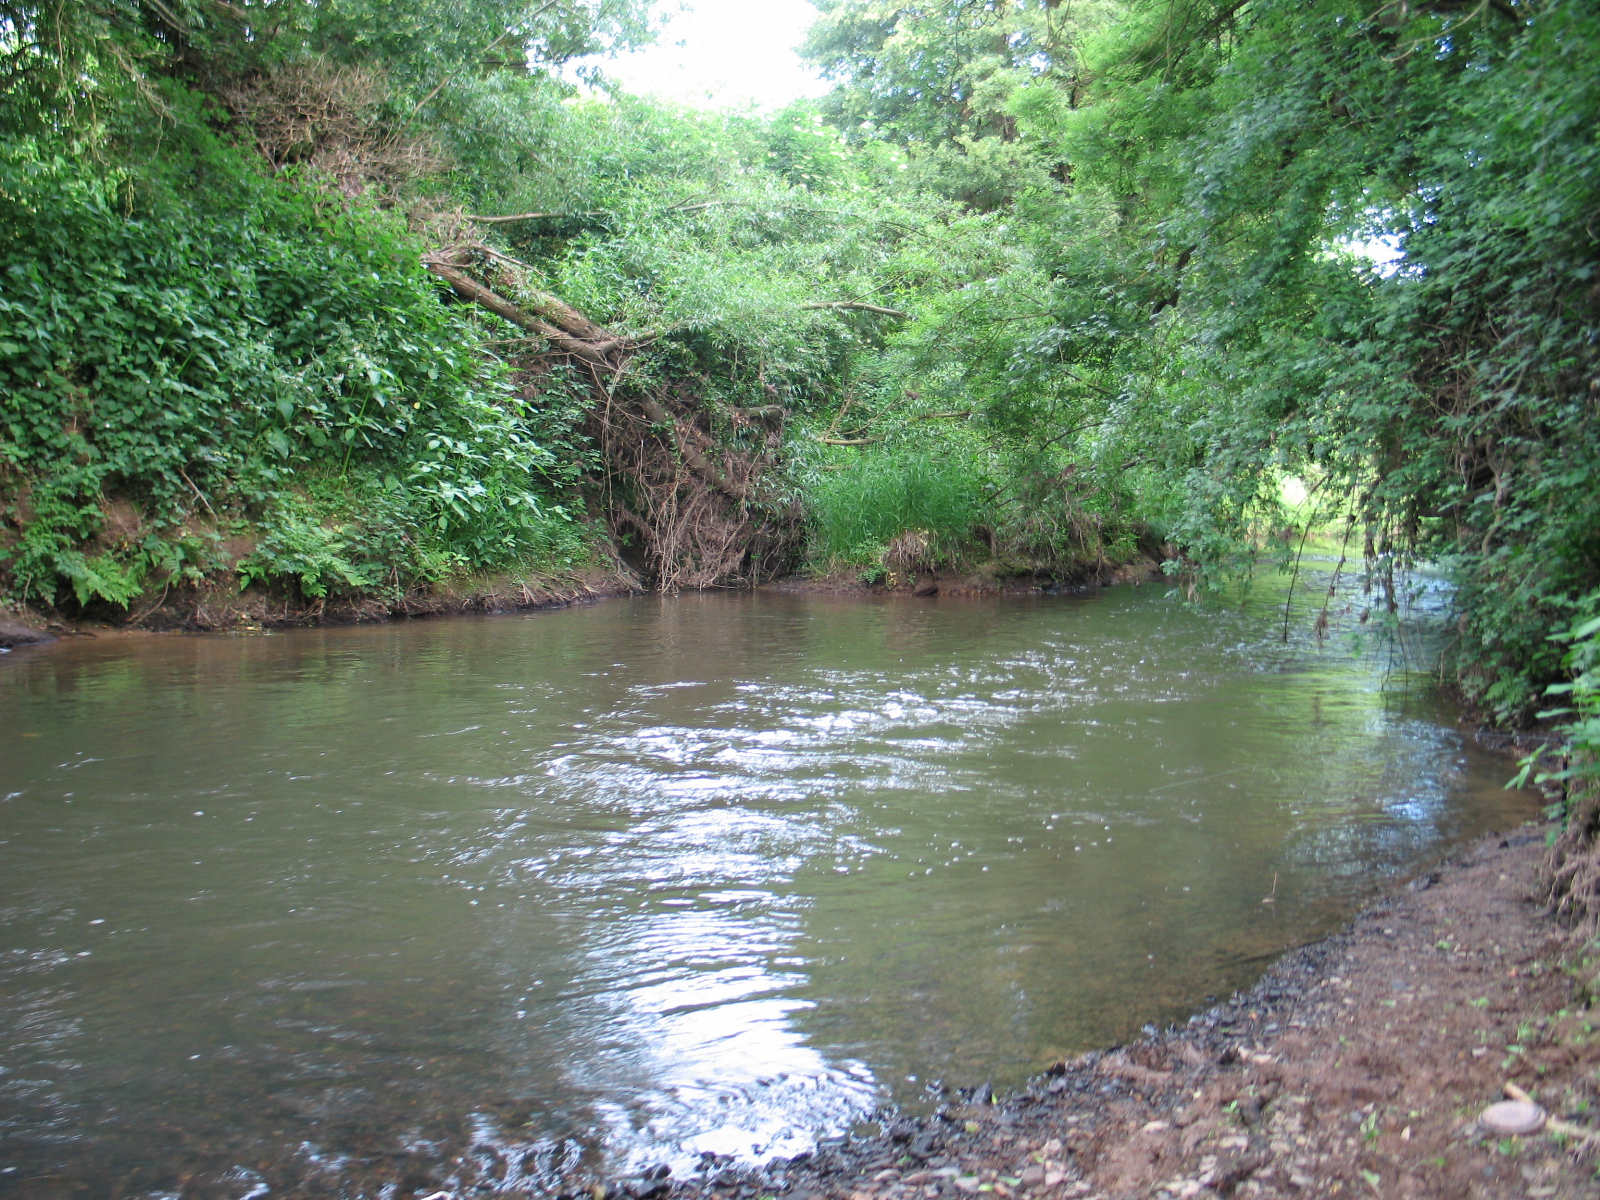 Small river barbel fis...